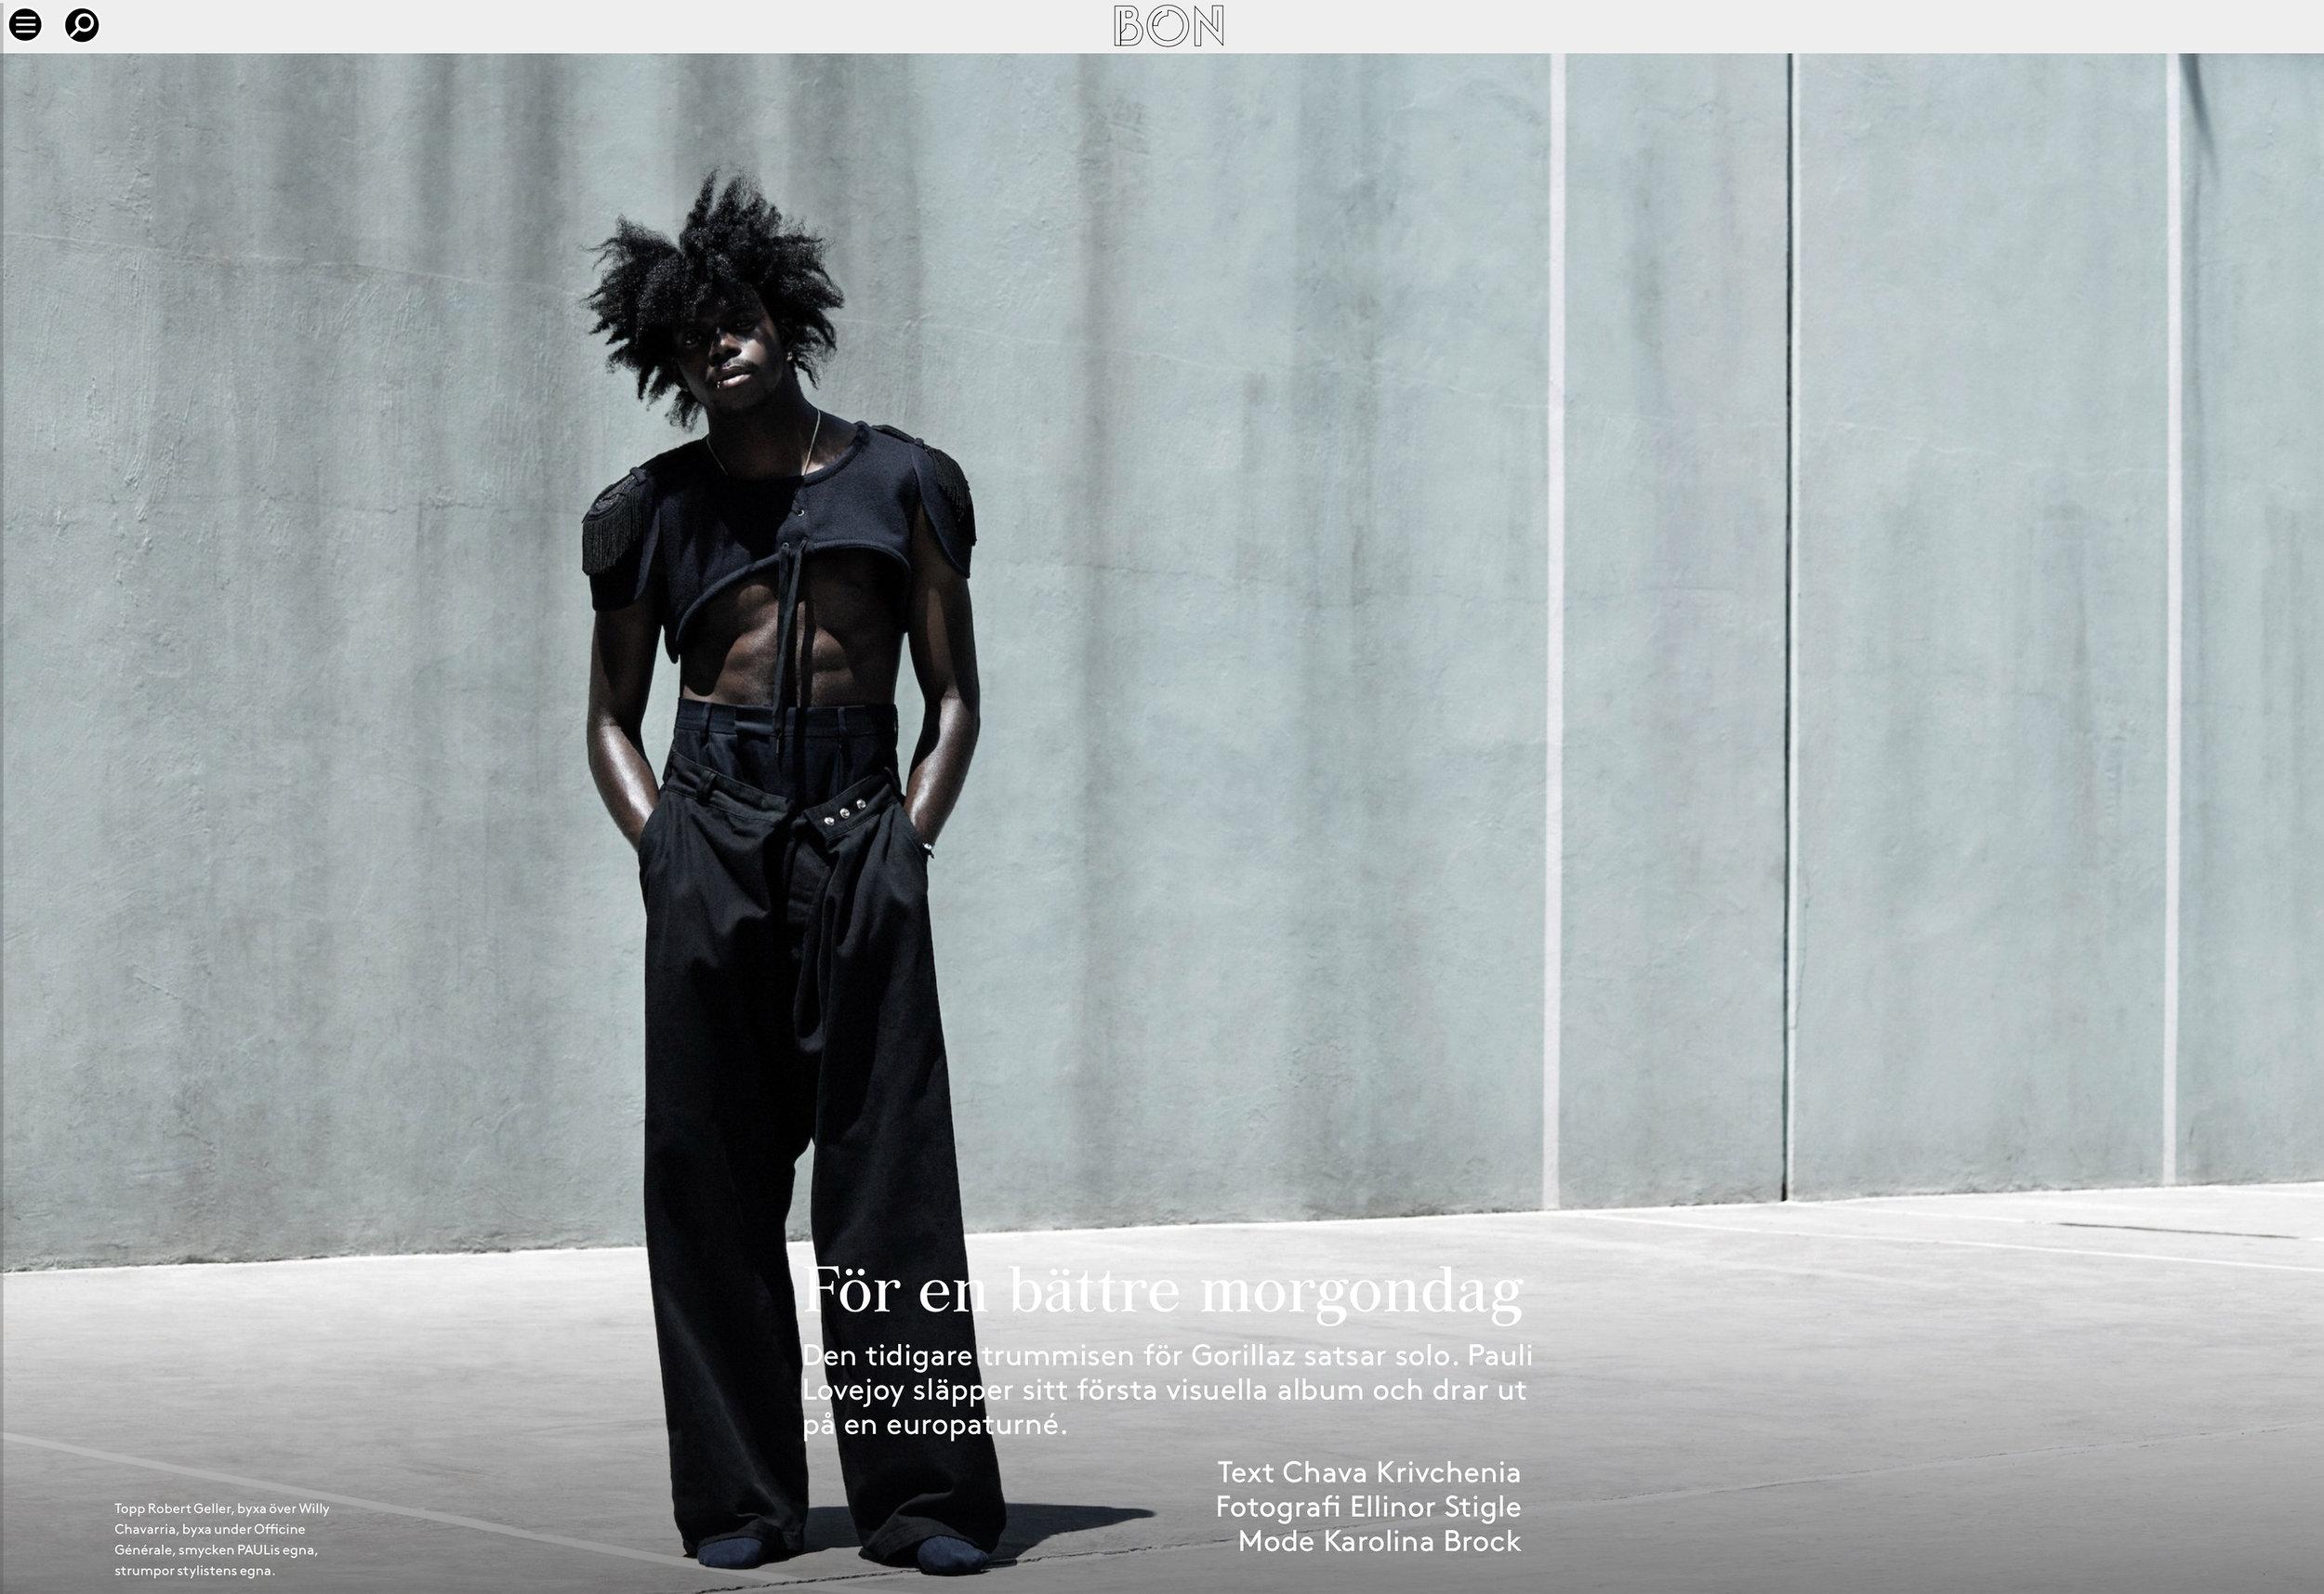 PAULi_lovejoy-ellinor-stigle-bon-magazine